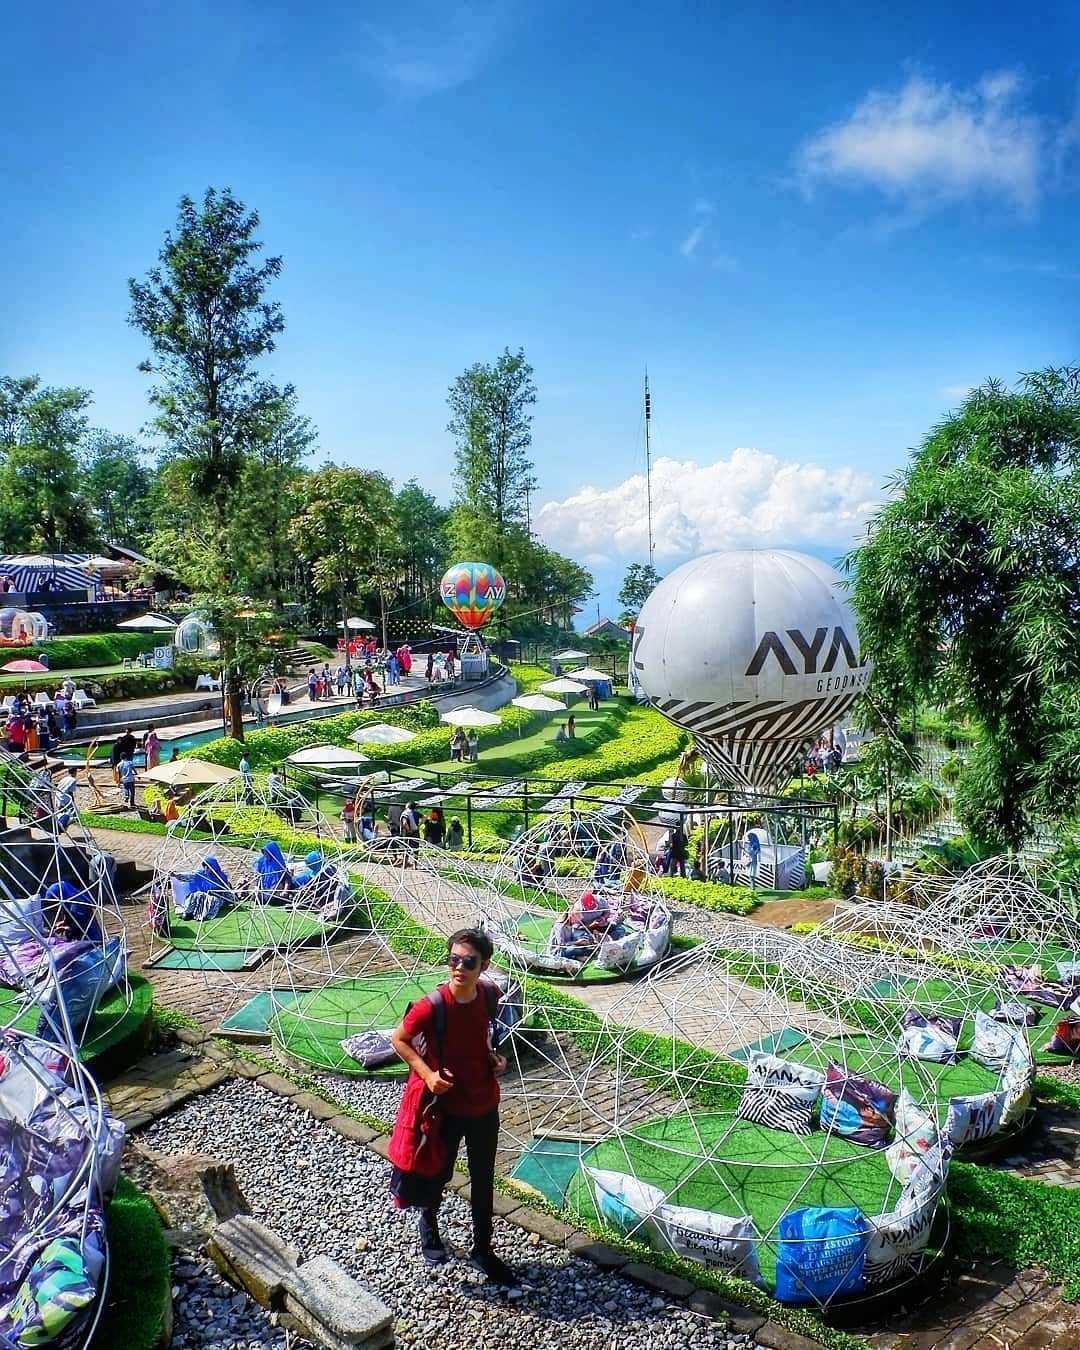 Berbagai Tempat Duduk Yang ada di Ayanaz Gedongsongo Semarang Image From @aankhosihan